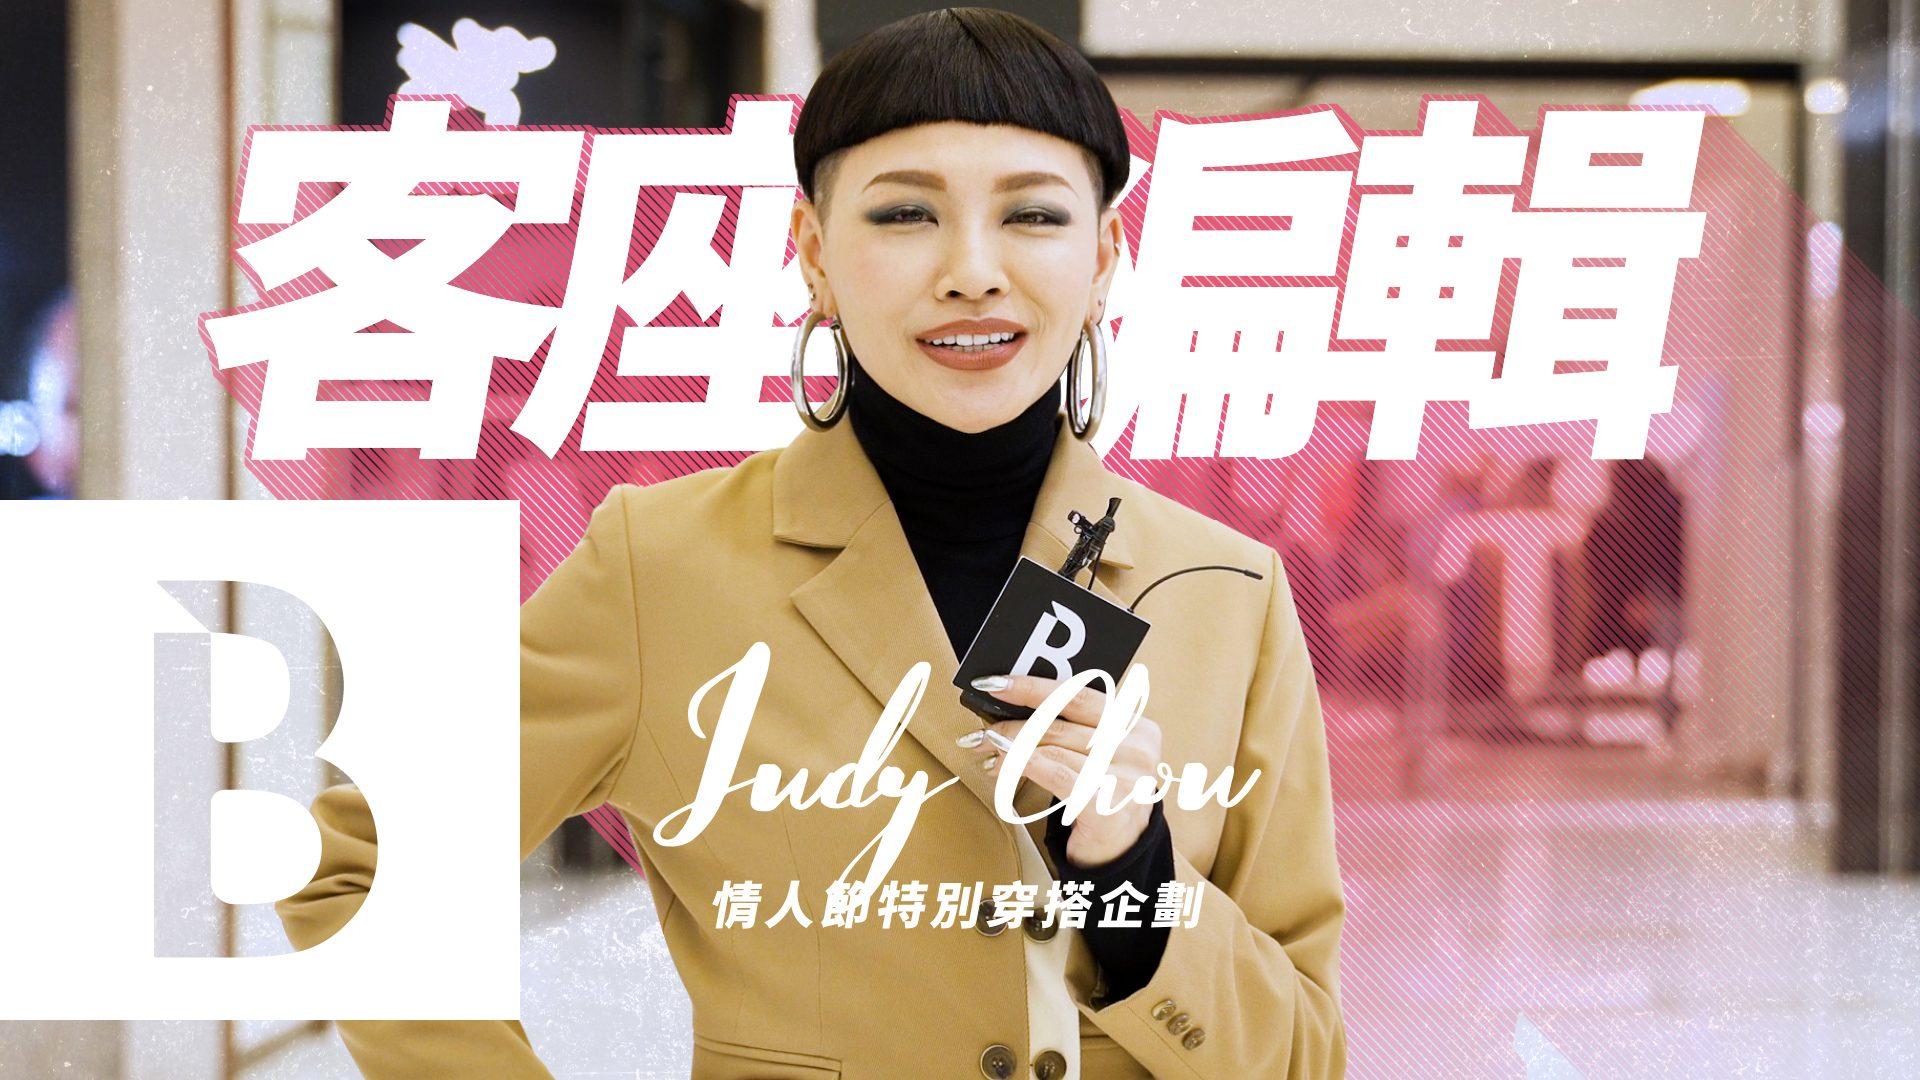 【Bella Ju 一下】造型師Judy Chou帶逛台茂百貨!傳授2020情侶裝怎麼穿最時尚 | Bella Taiwan